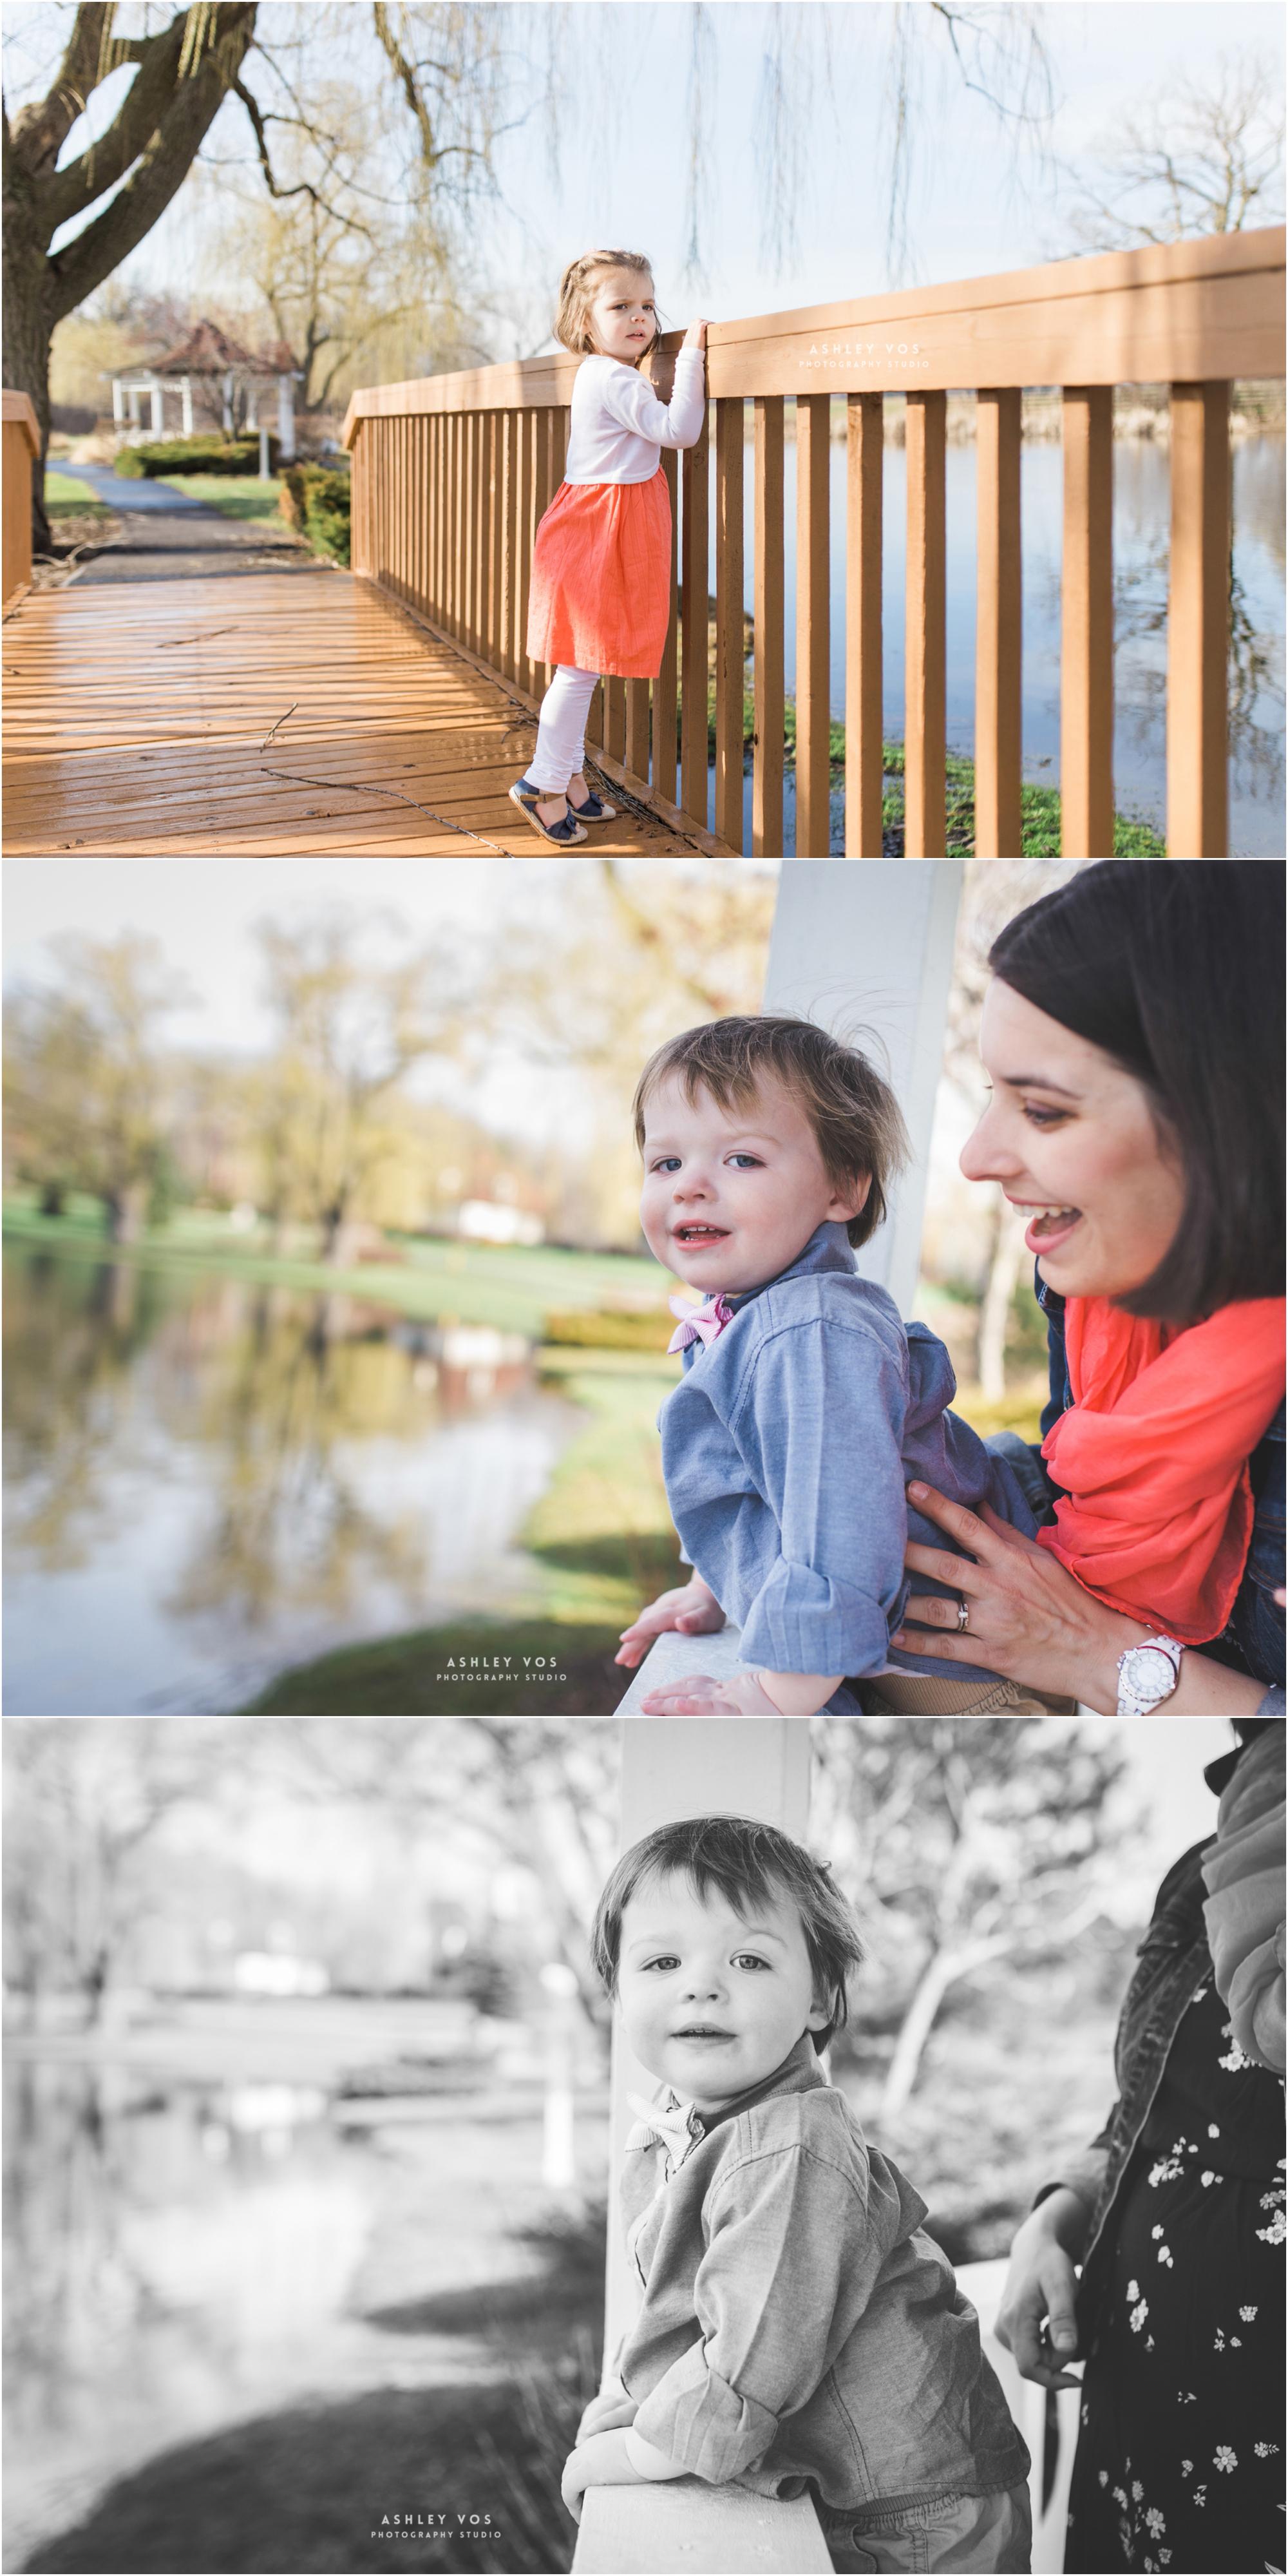 Ashley Vos Photography Seattle Lifestyle Family Photography_0031.jpg